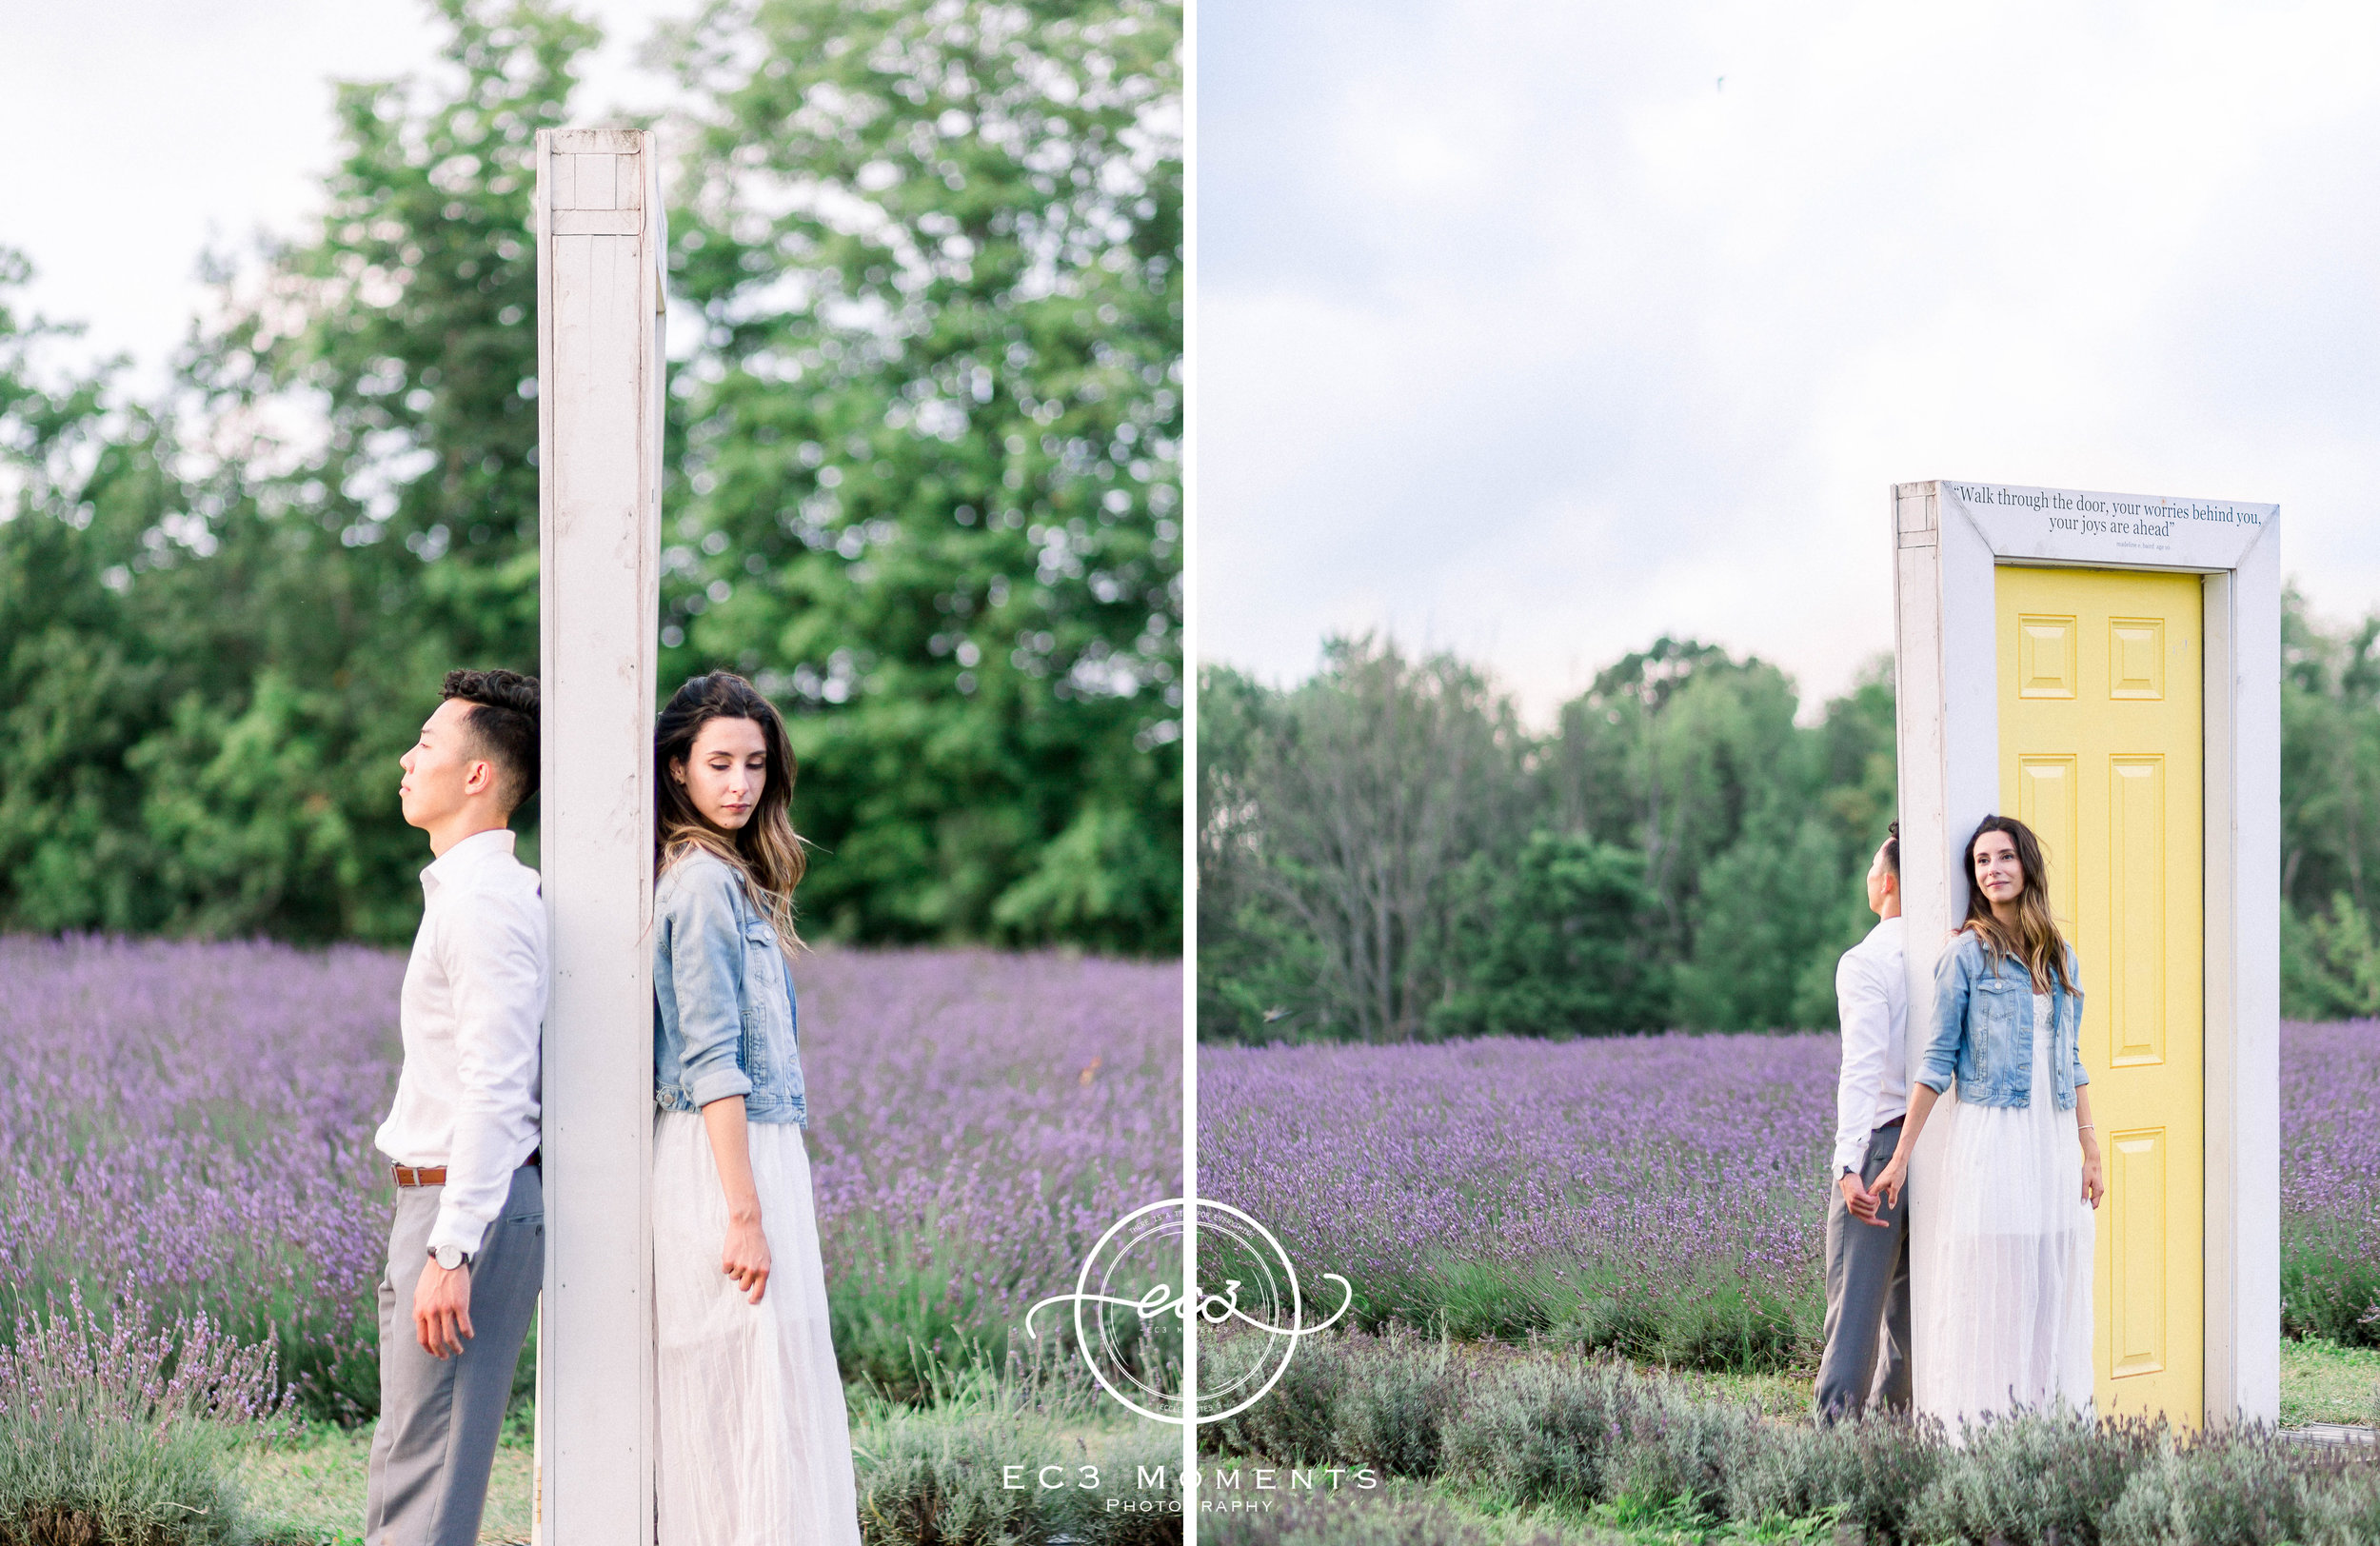 Laura & Ryan Terre Bleu Summer Surprise Proposal 16.jpg